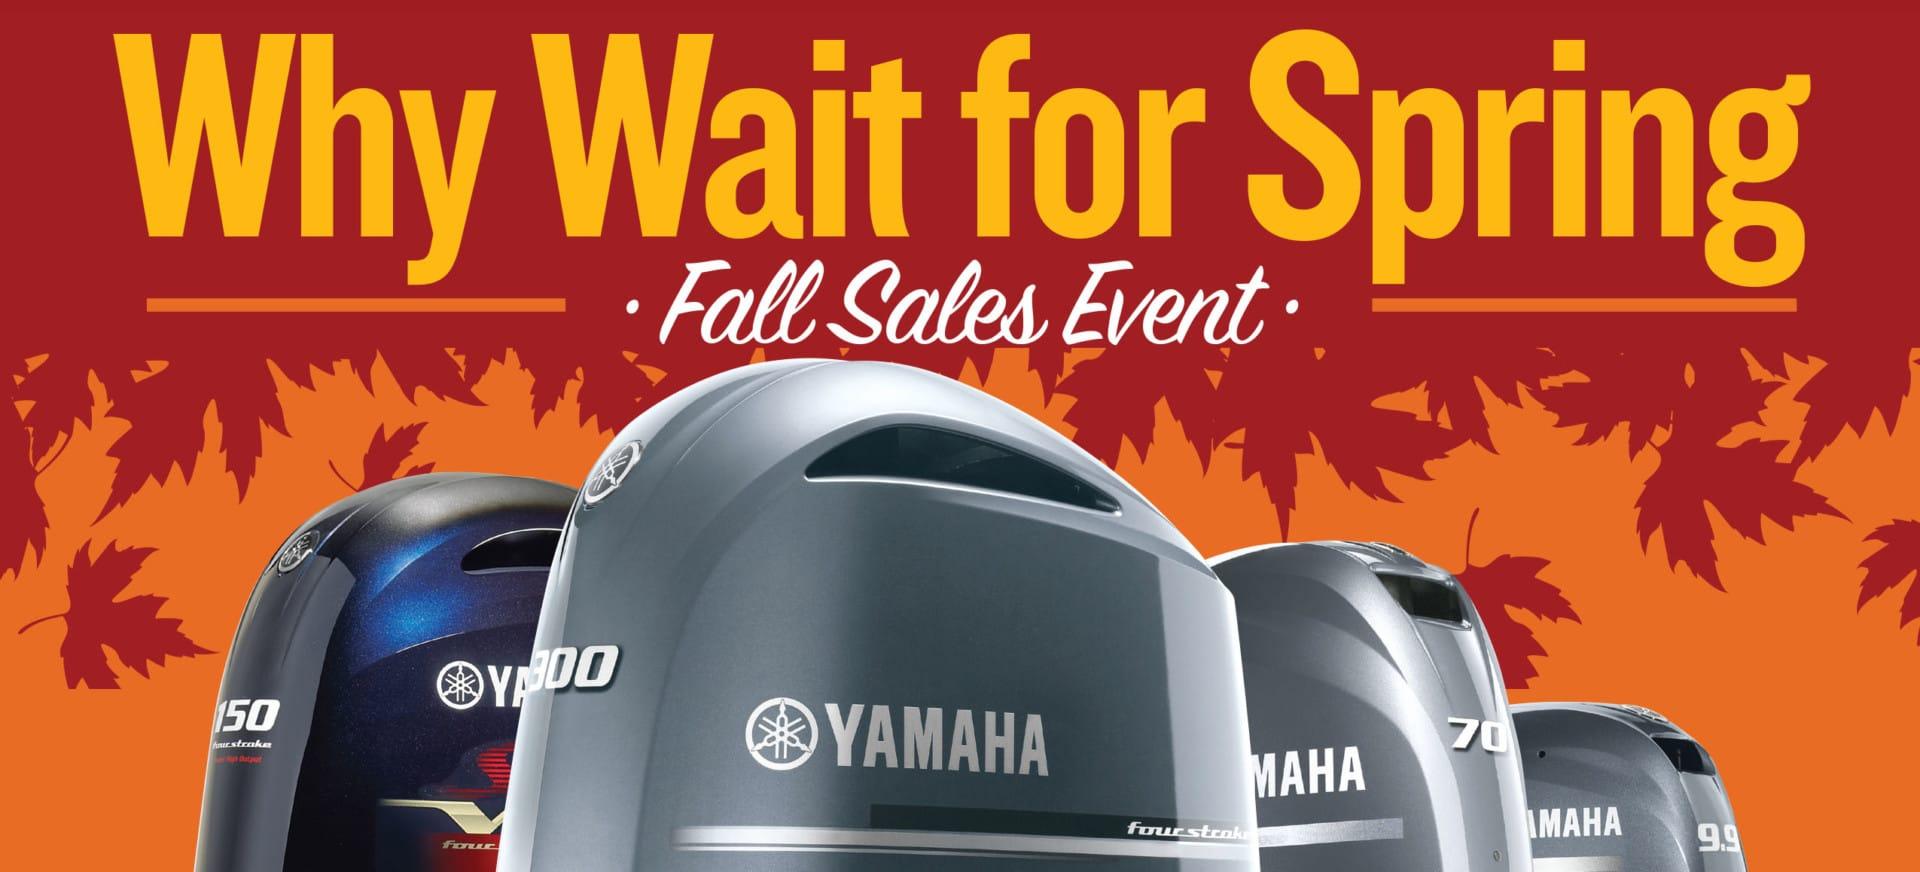 Yamaha Fall Sales Event